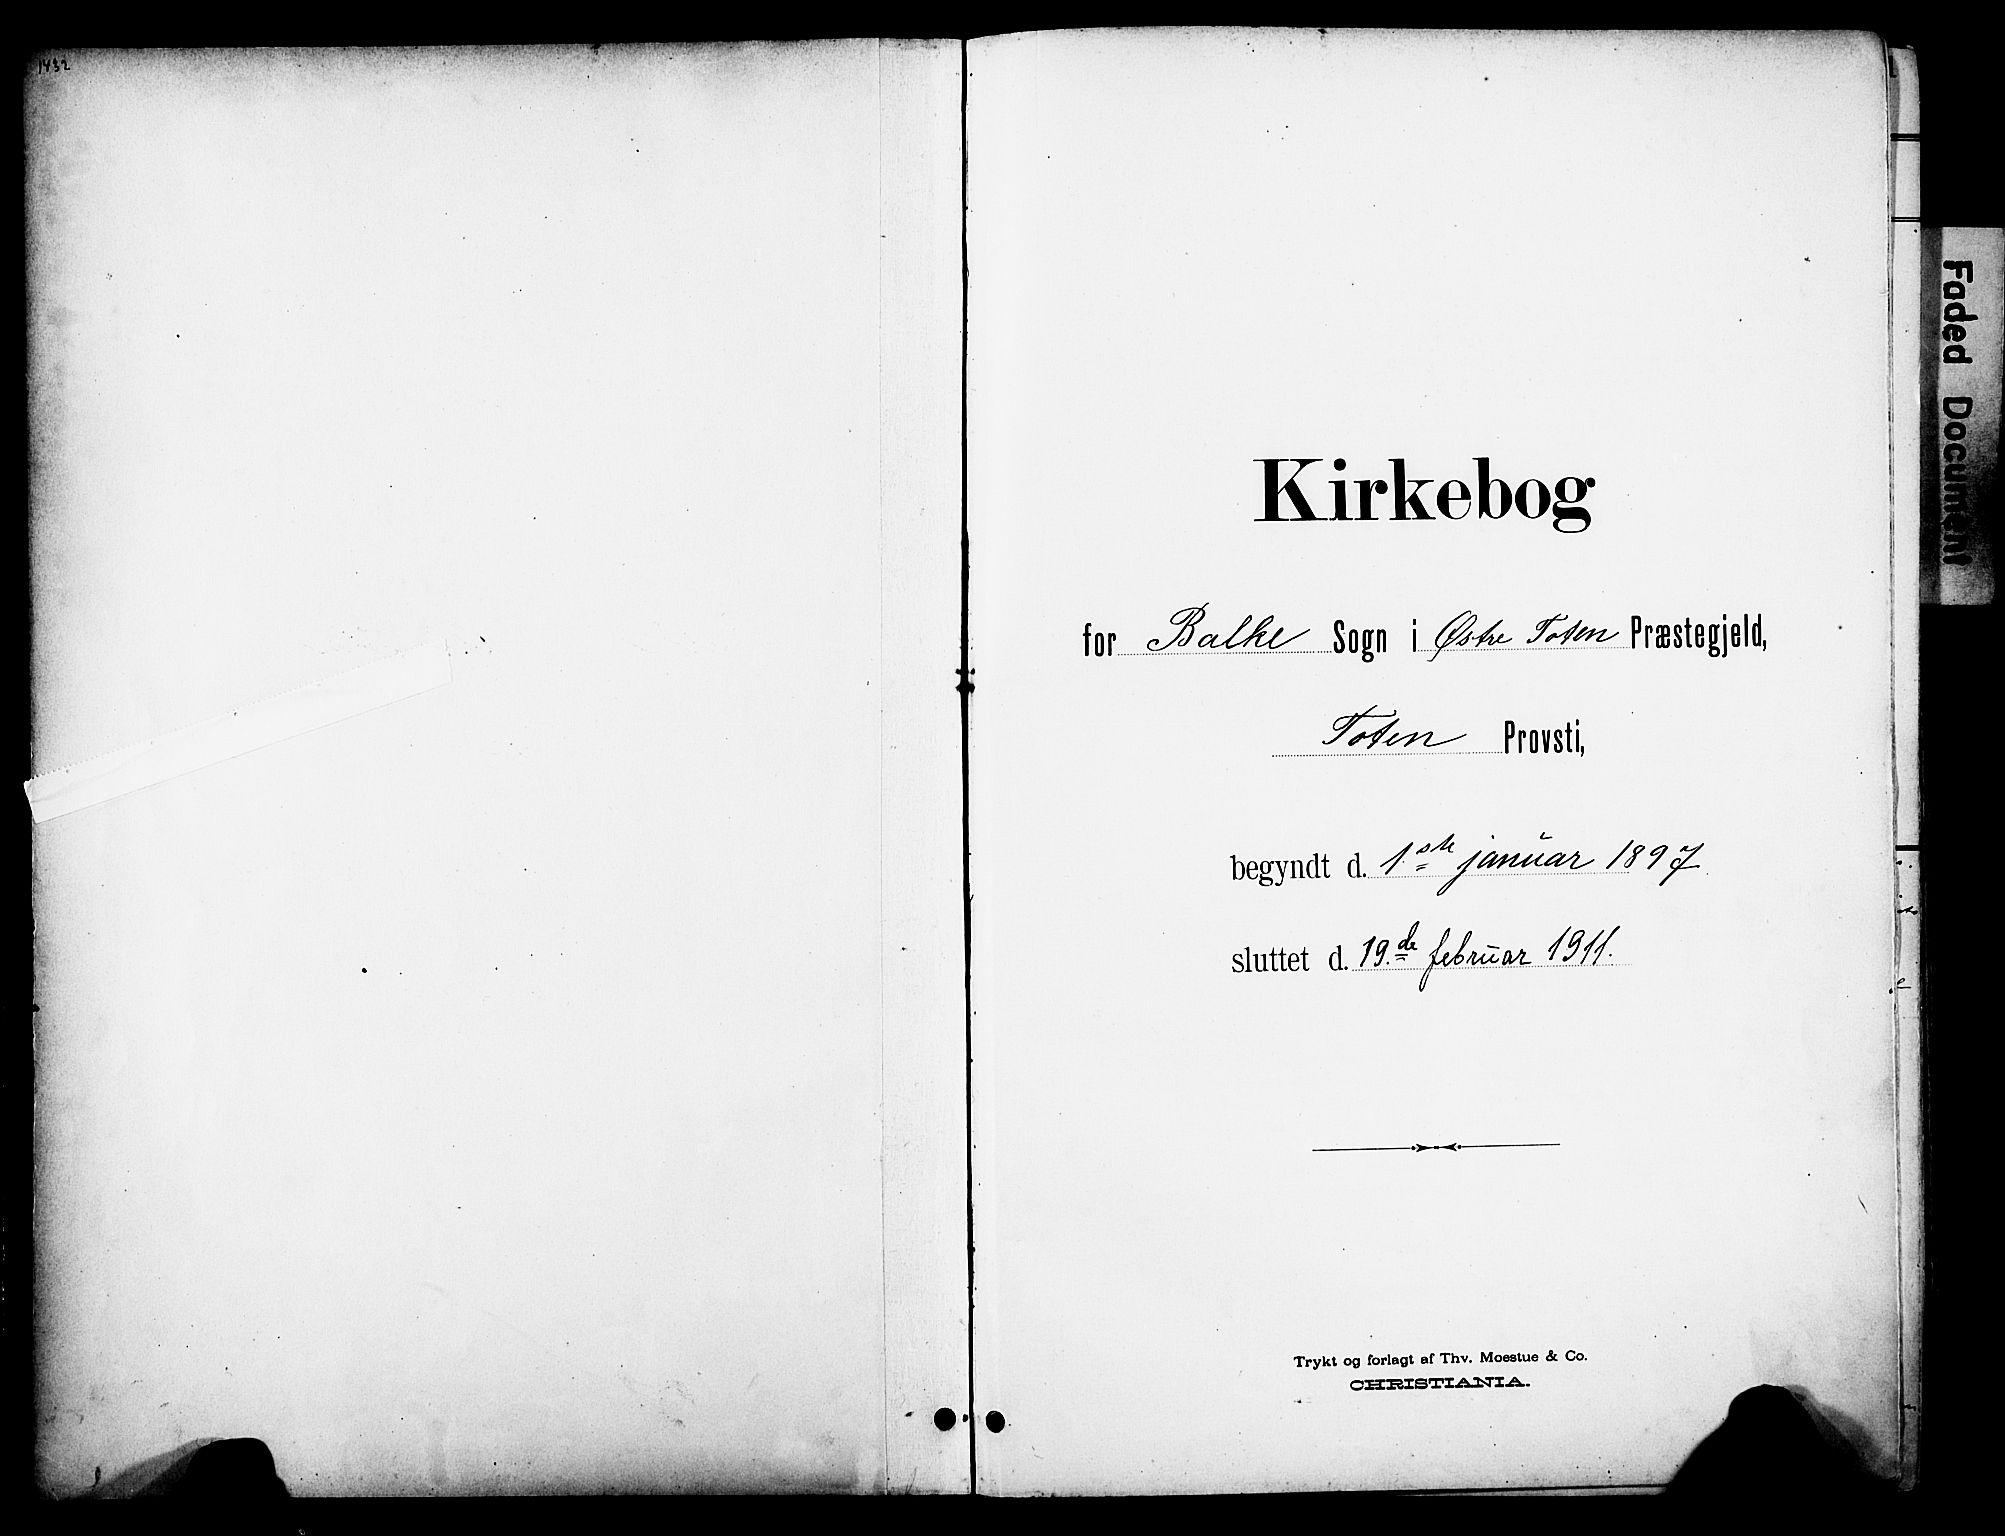 SAH, Østre Toten prestekontor, Ministerialbok nr. 9, 1897-1913